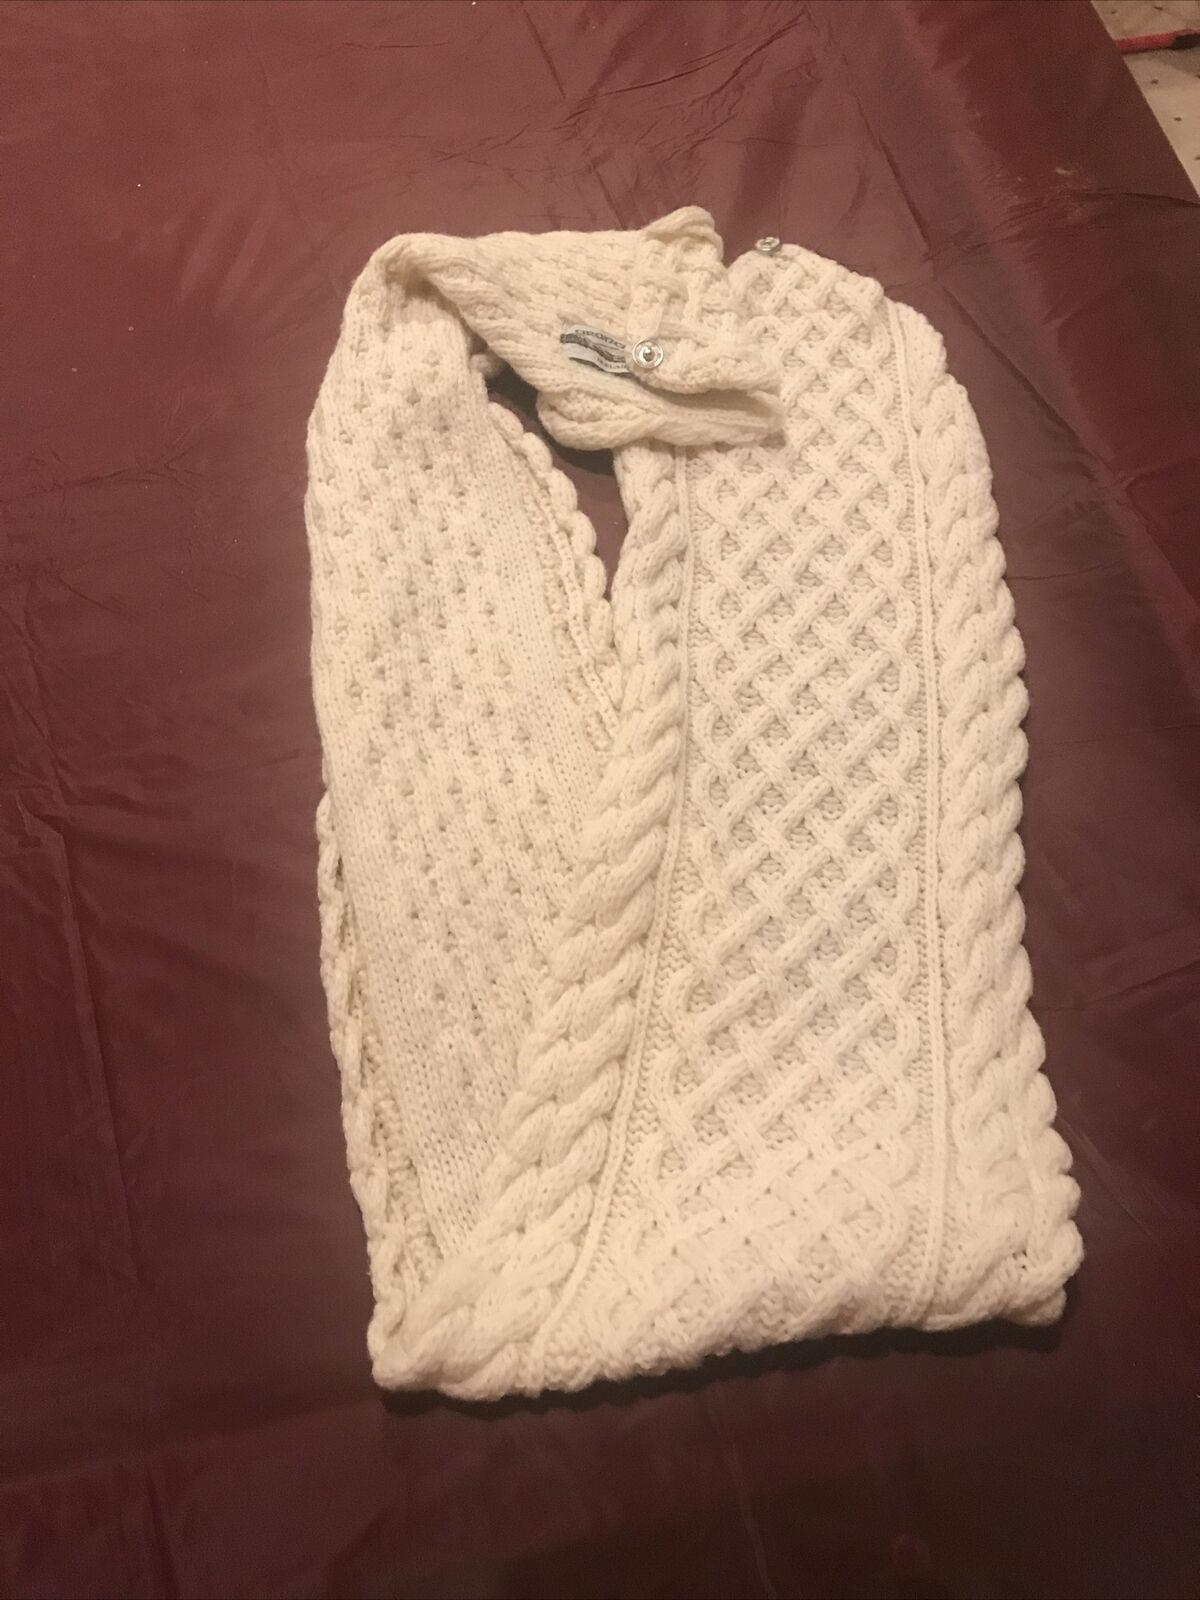 Aran Crafts scarf   100% Merino Wool Scarf Made in Ireland   Color: Cream